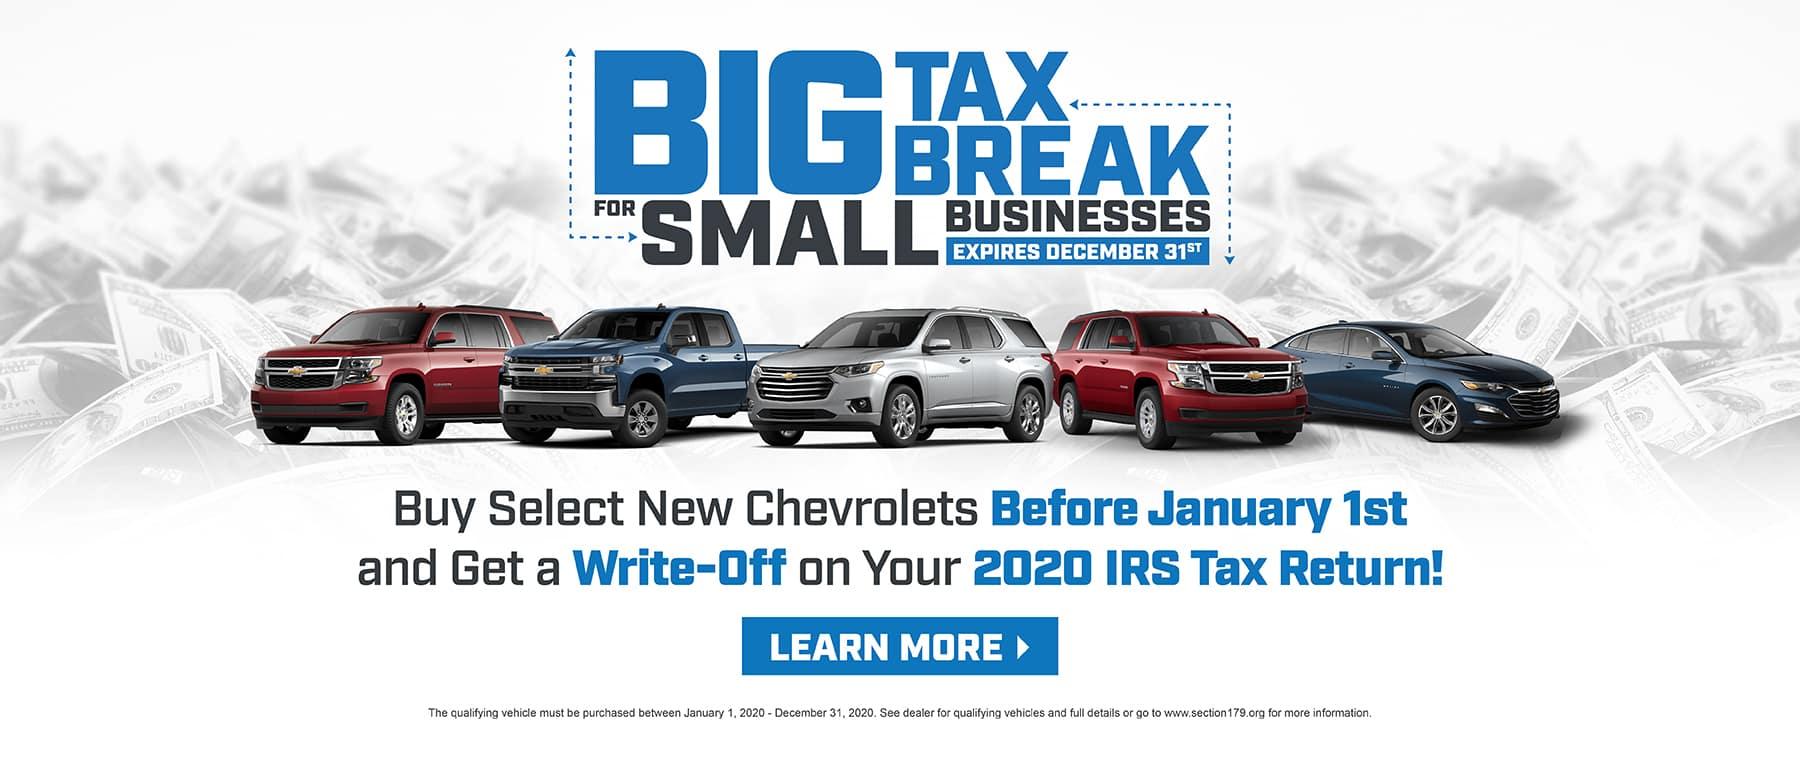 Big Tax Break for Small Business